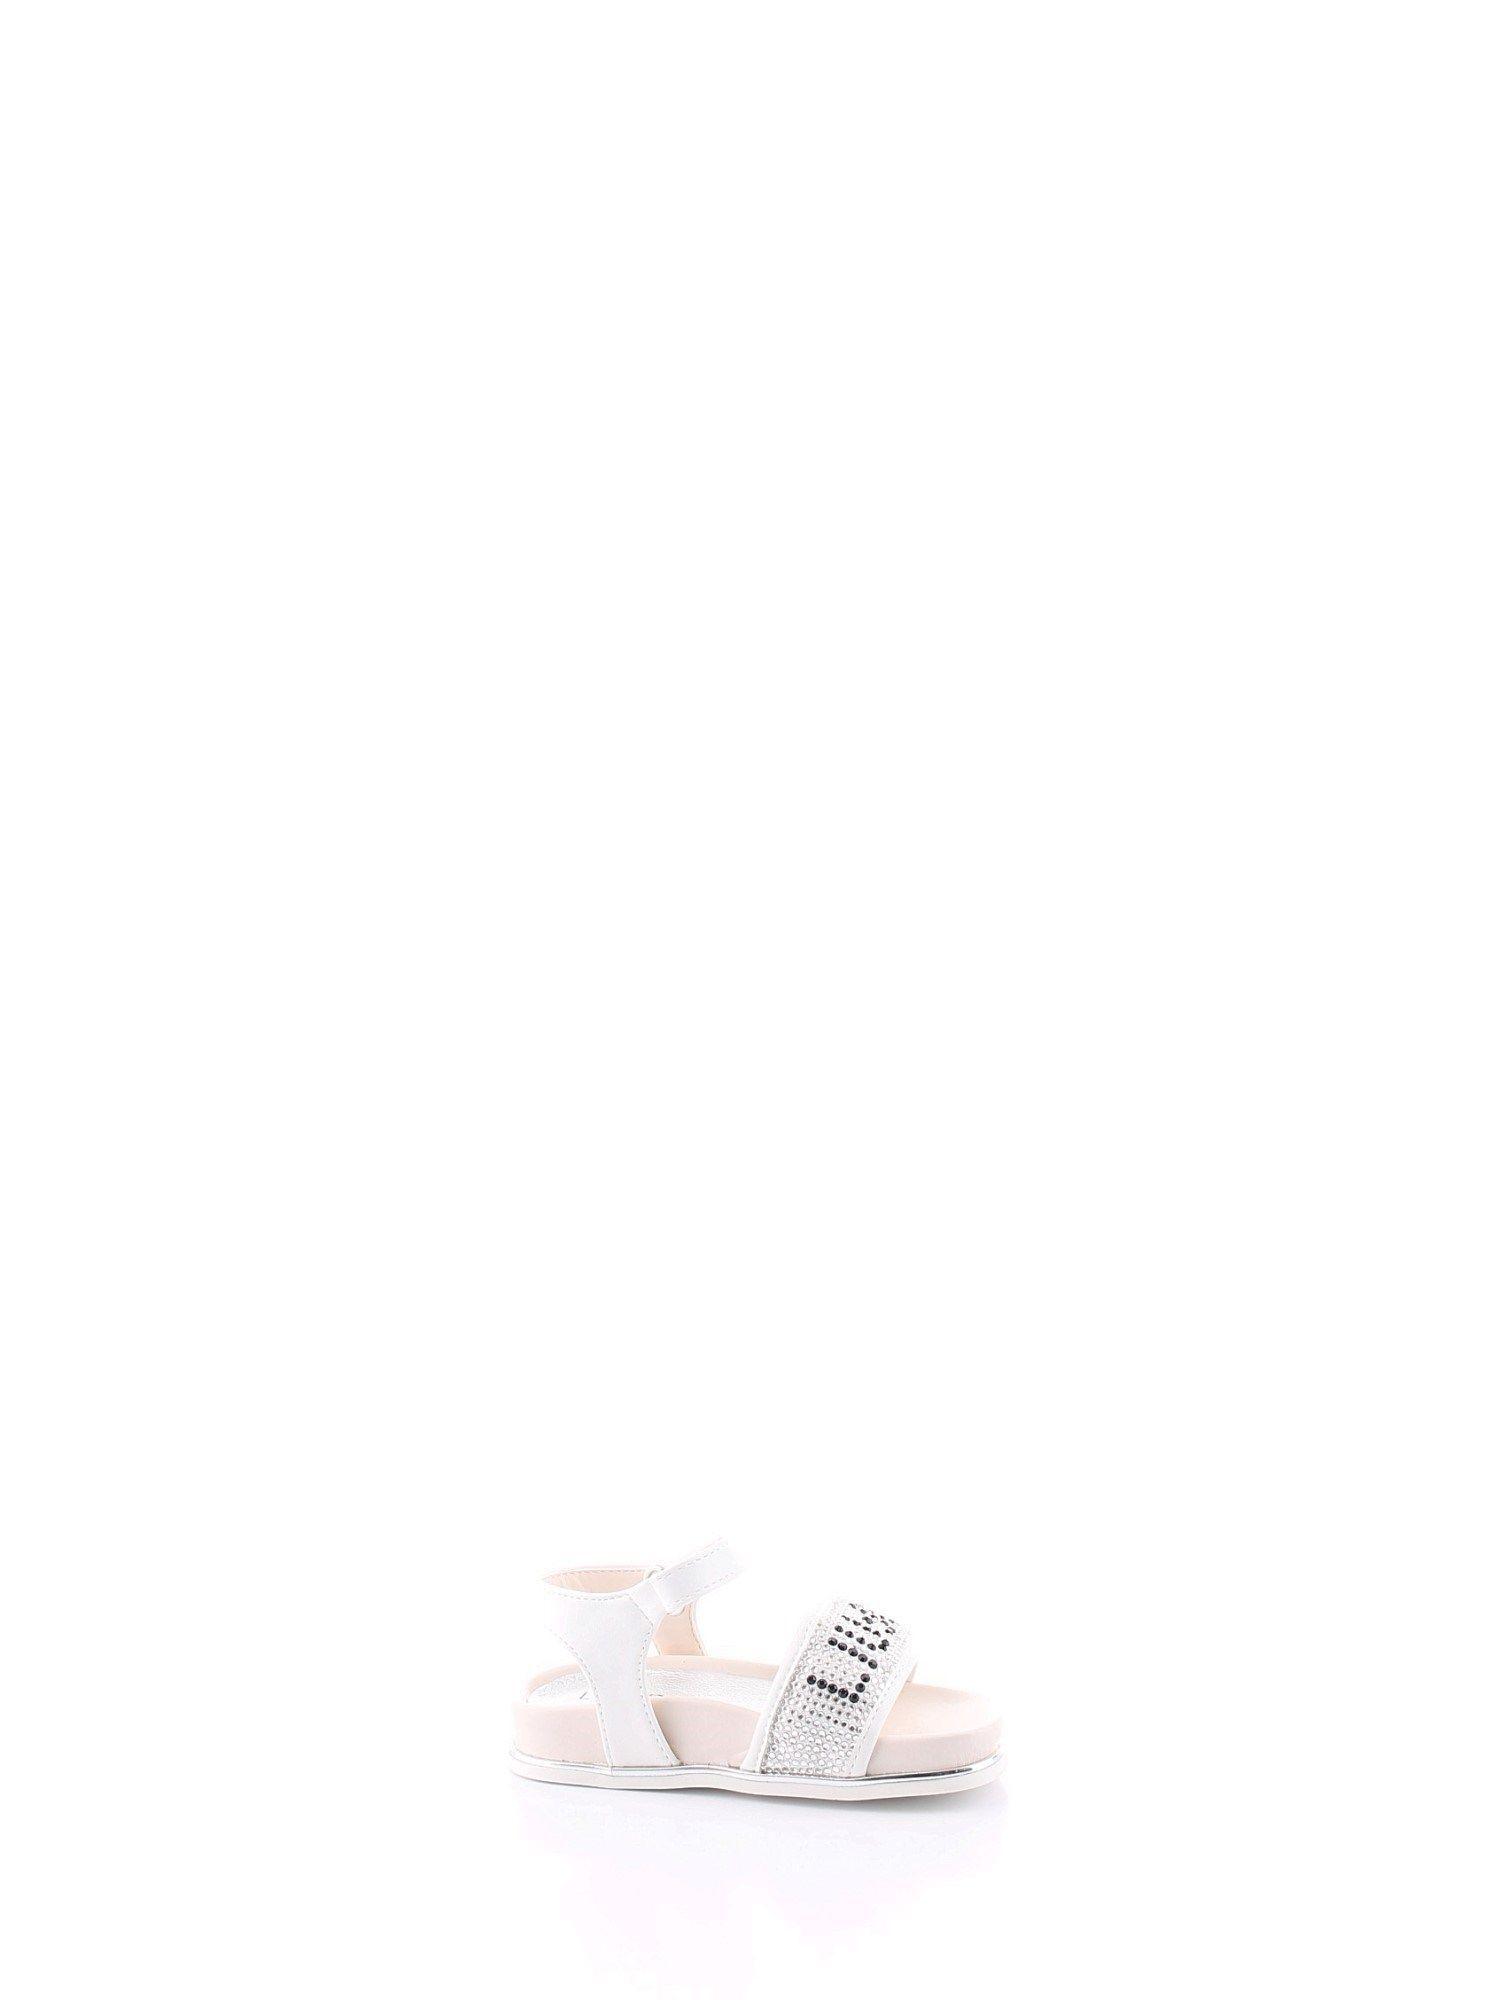 LIU JO GIRLS 4A0323EX013S1400 WHITE LEATHER SANDALS